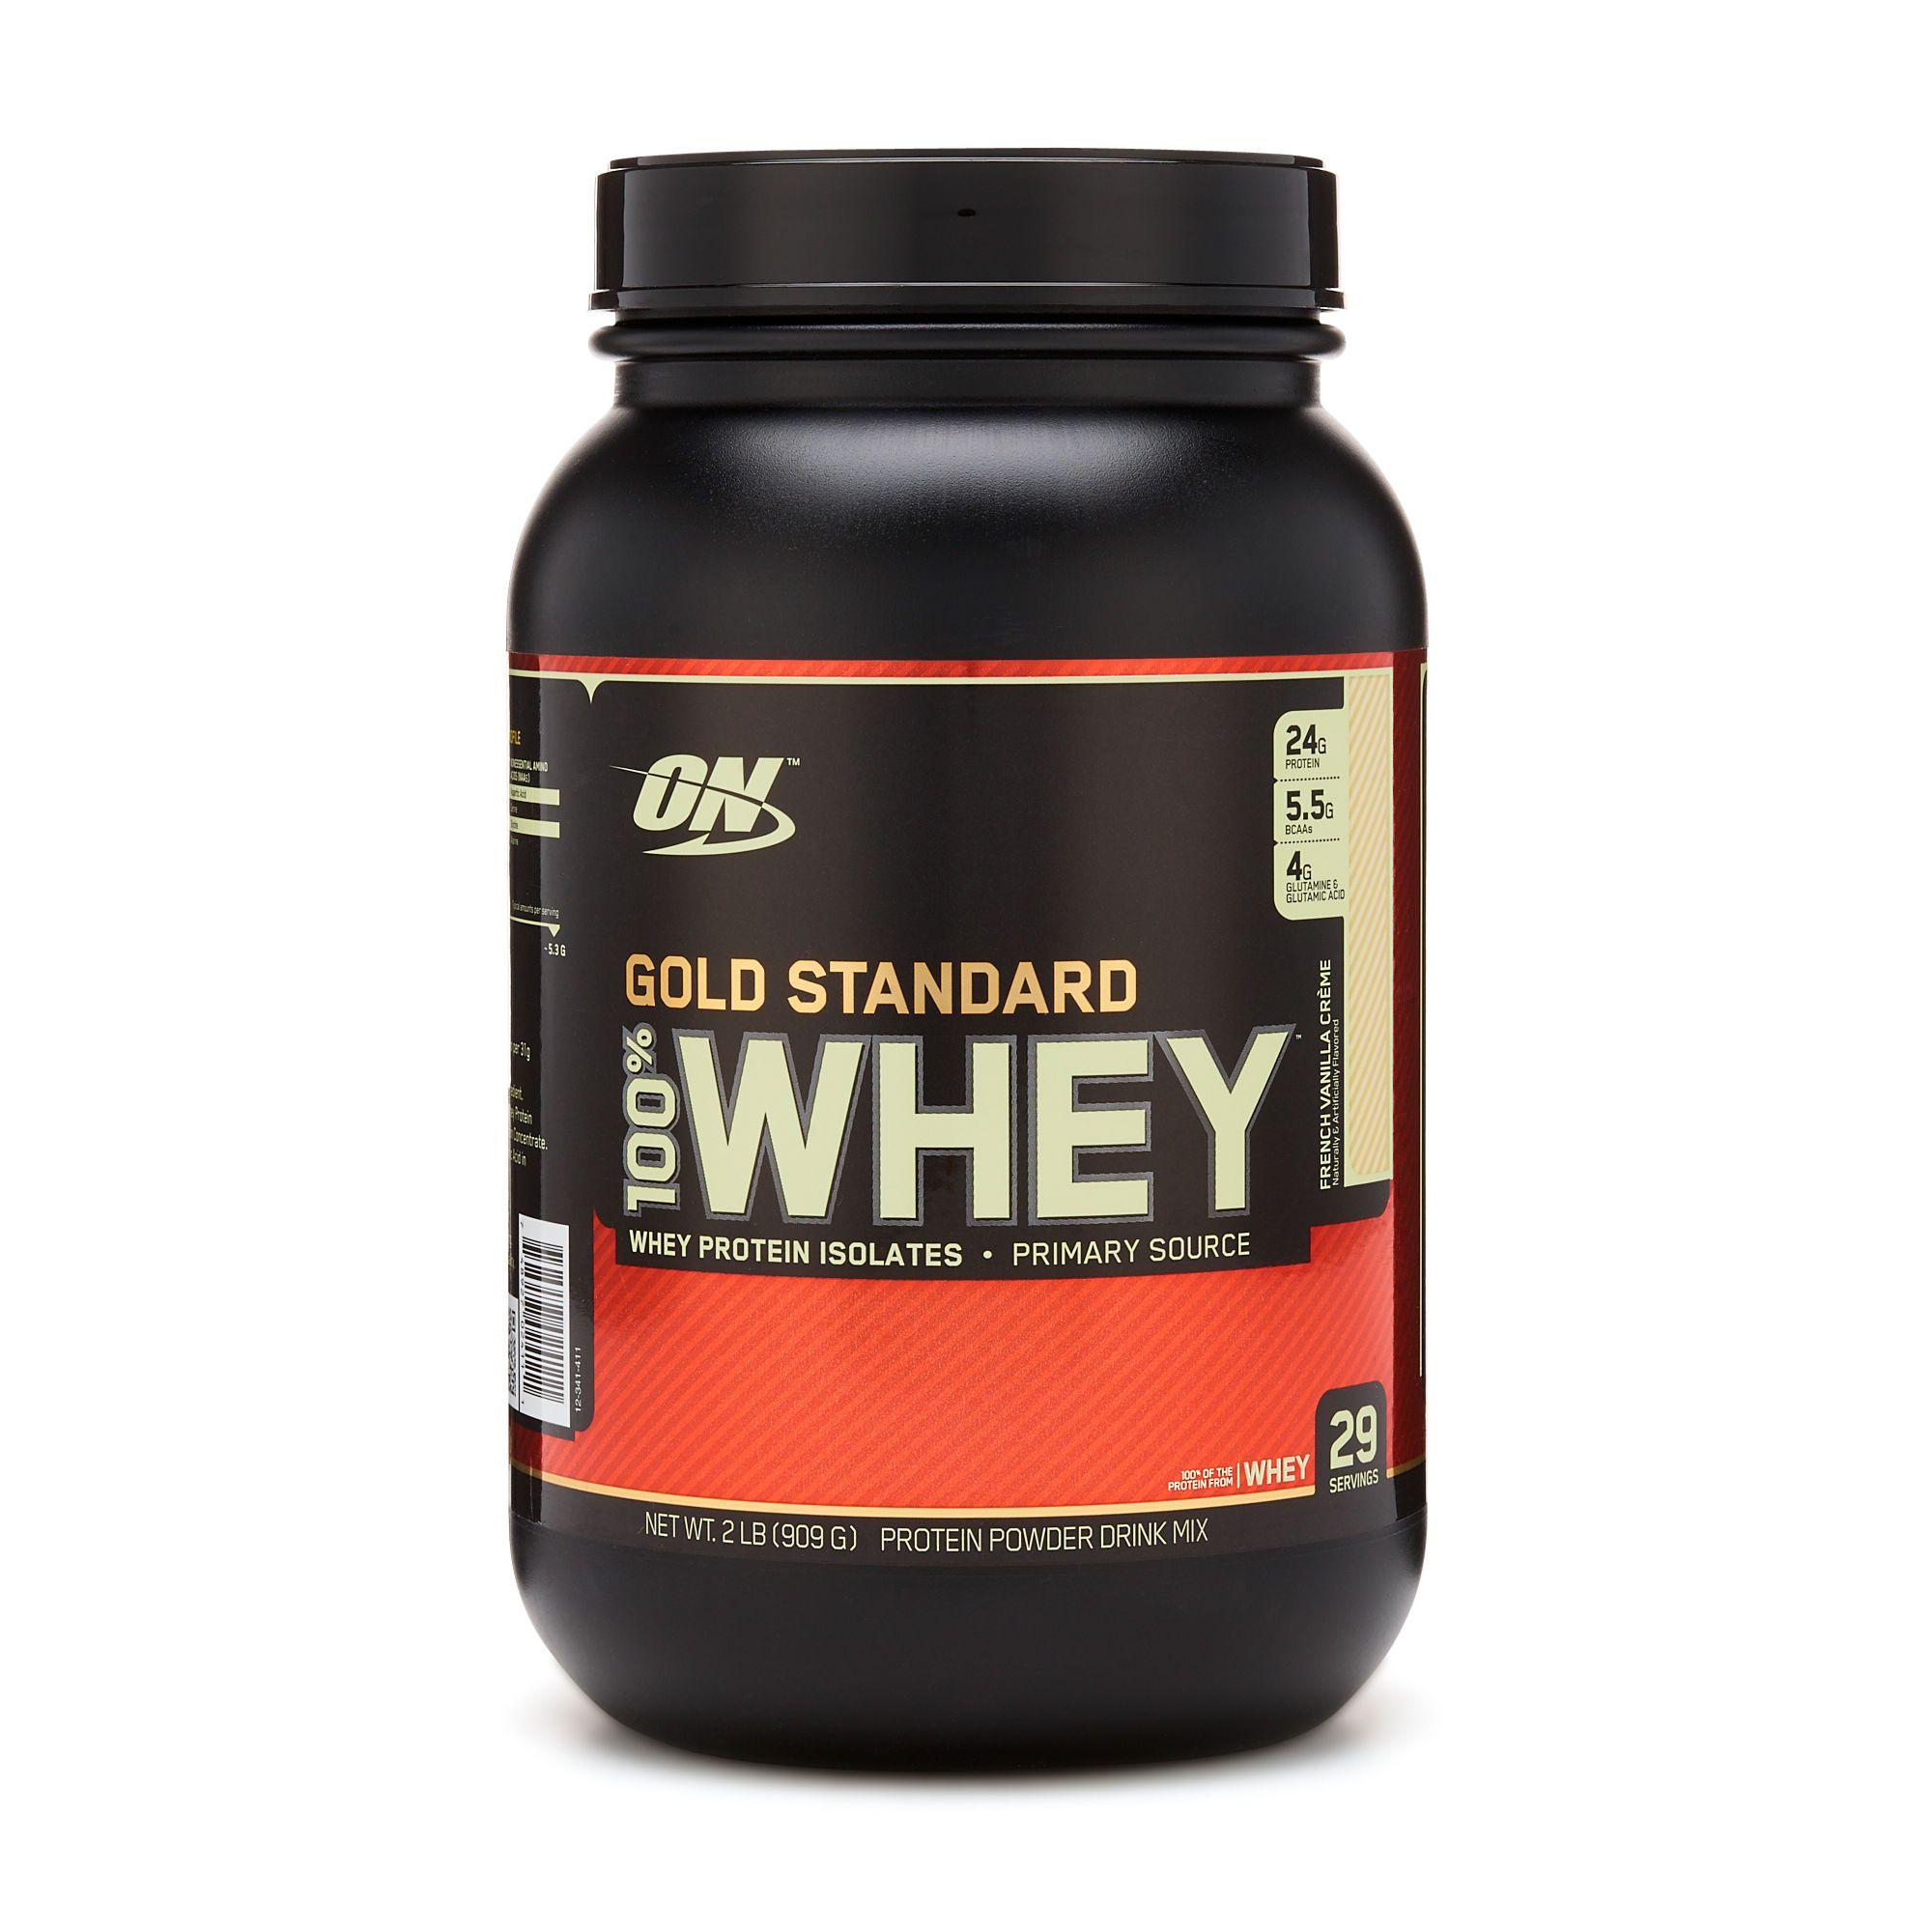 Gold Standard 100 Whey French Vanilla Creme Gold Standard Whey Gold Standard Whey Protein Optimum Nutrition Gold Standard